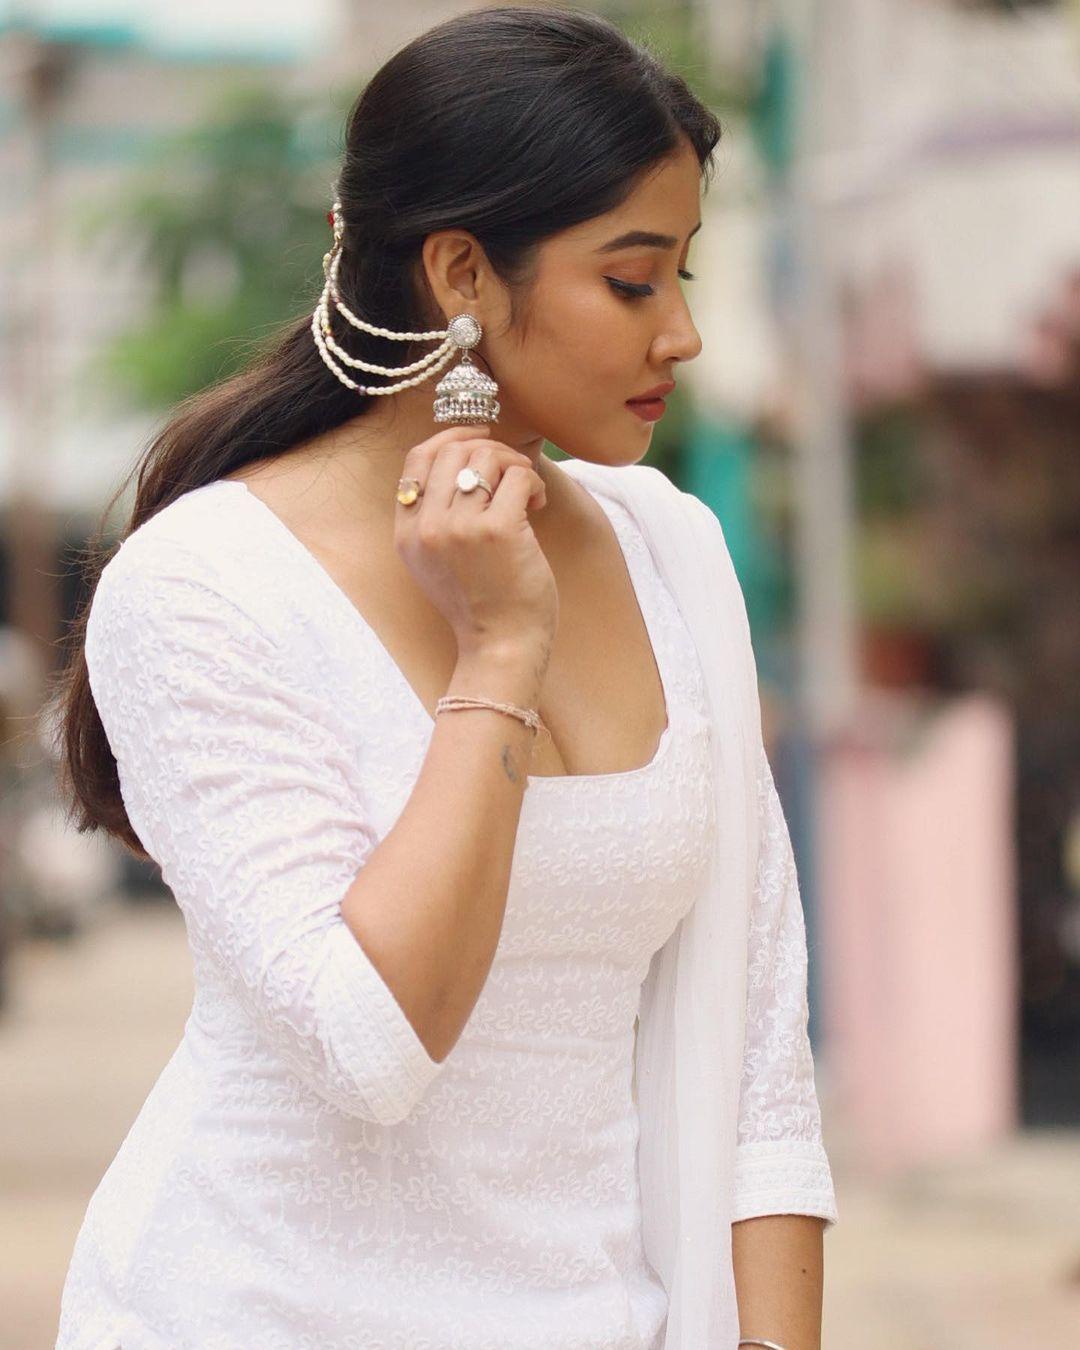 Model Actress Sofia Ansari Latest Hot Photos in White Dress